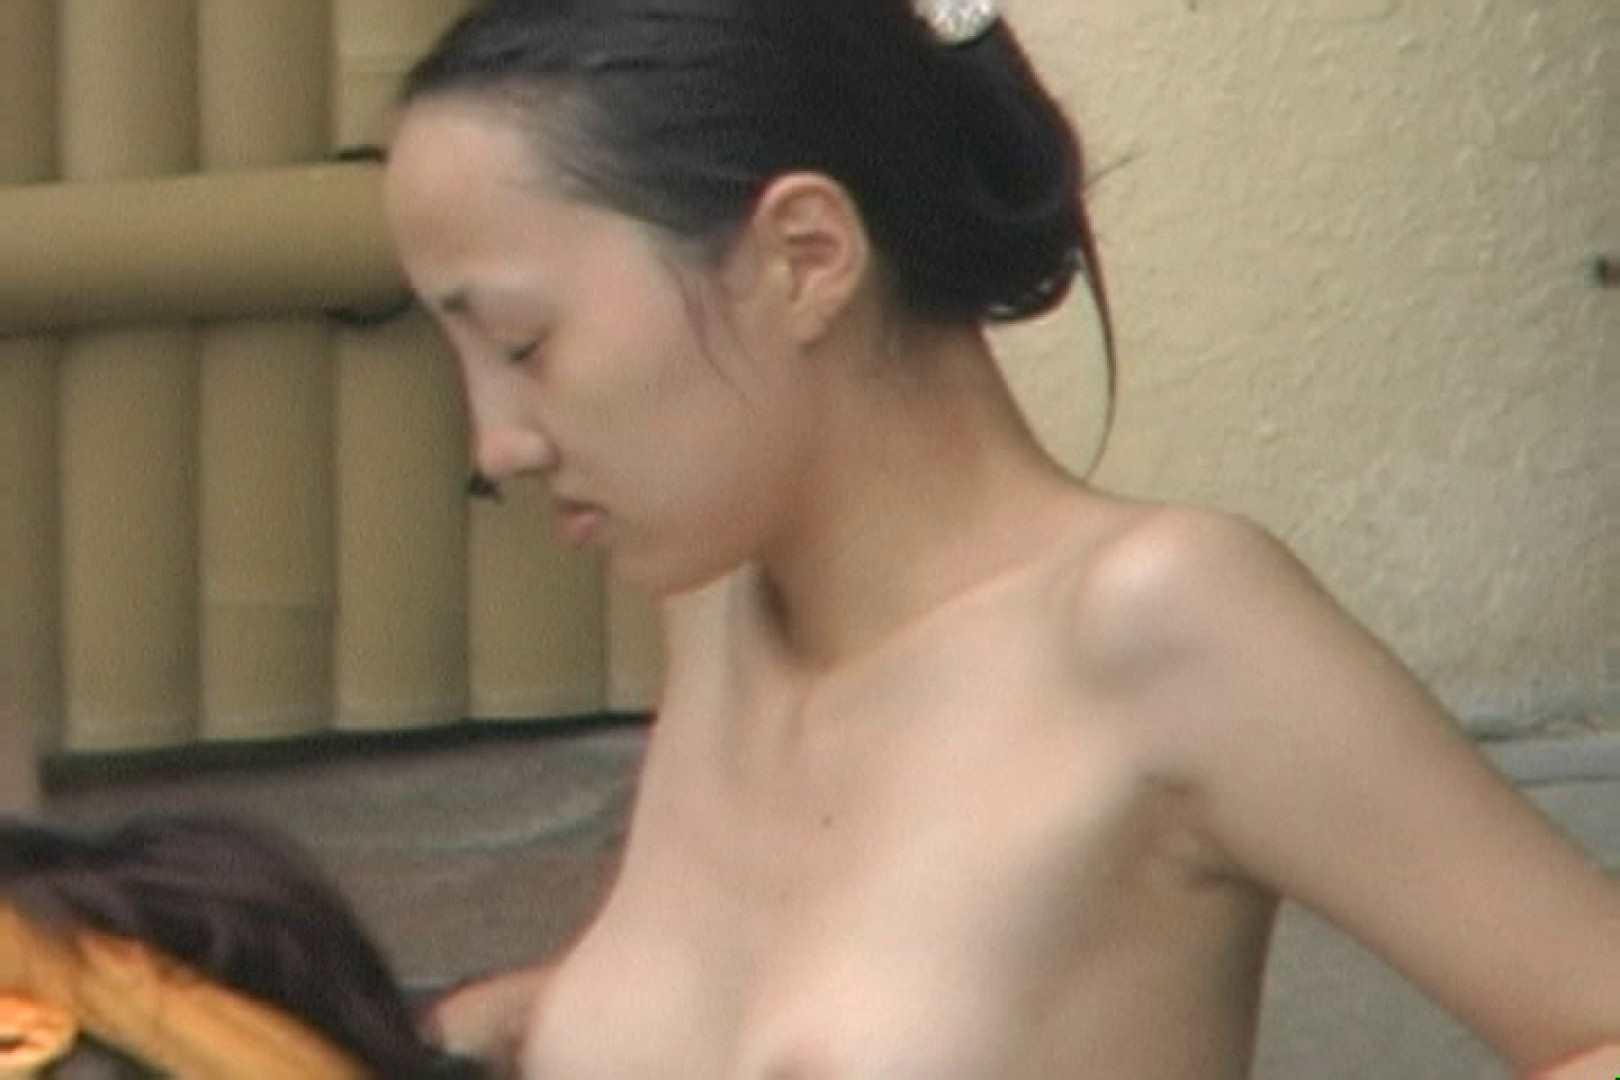 Aquaな露天風呂Vol.41 綺麗なOLたち  89枚 63